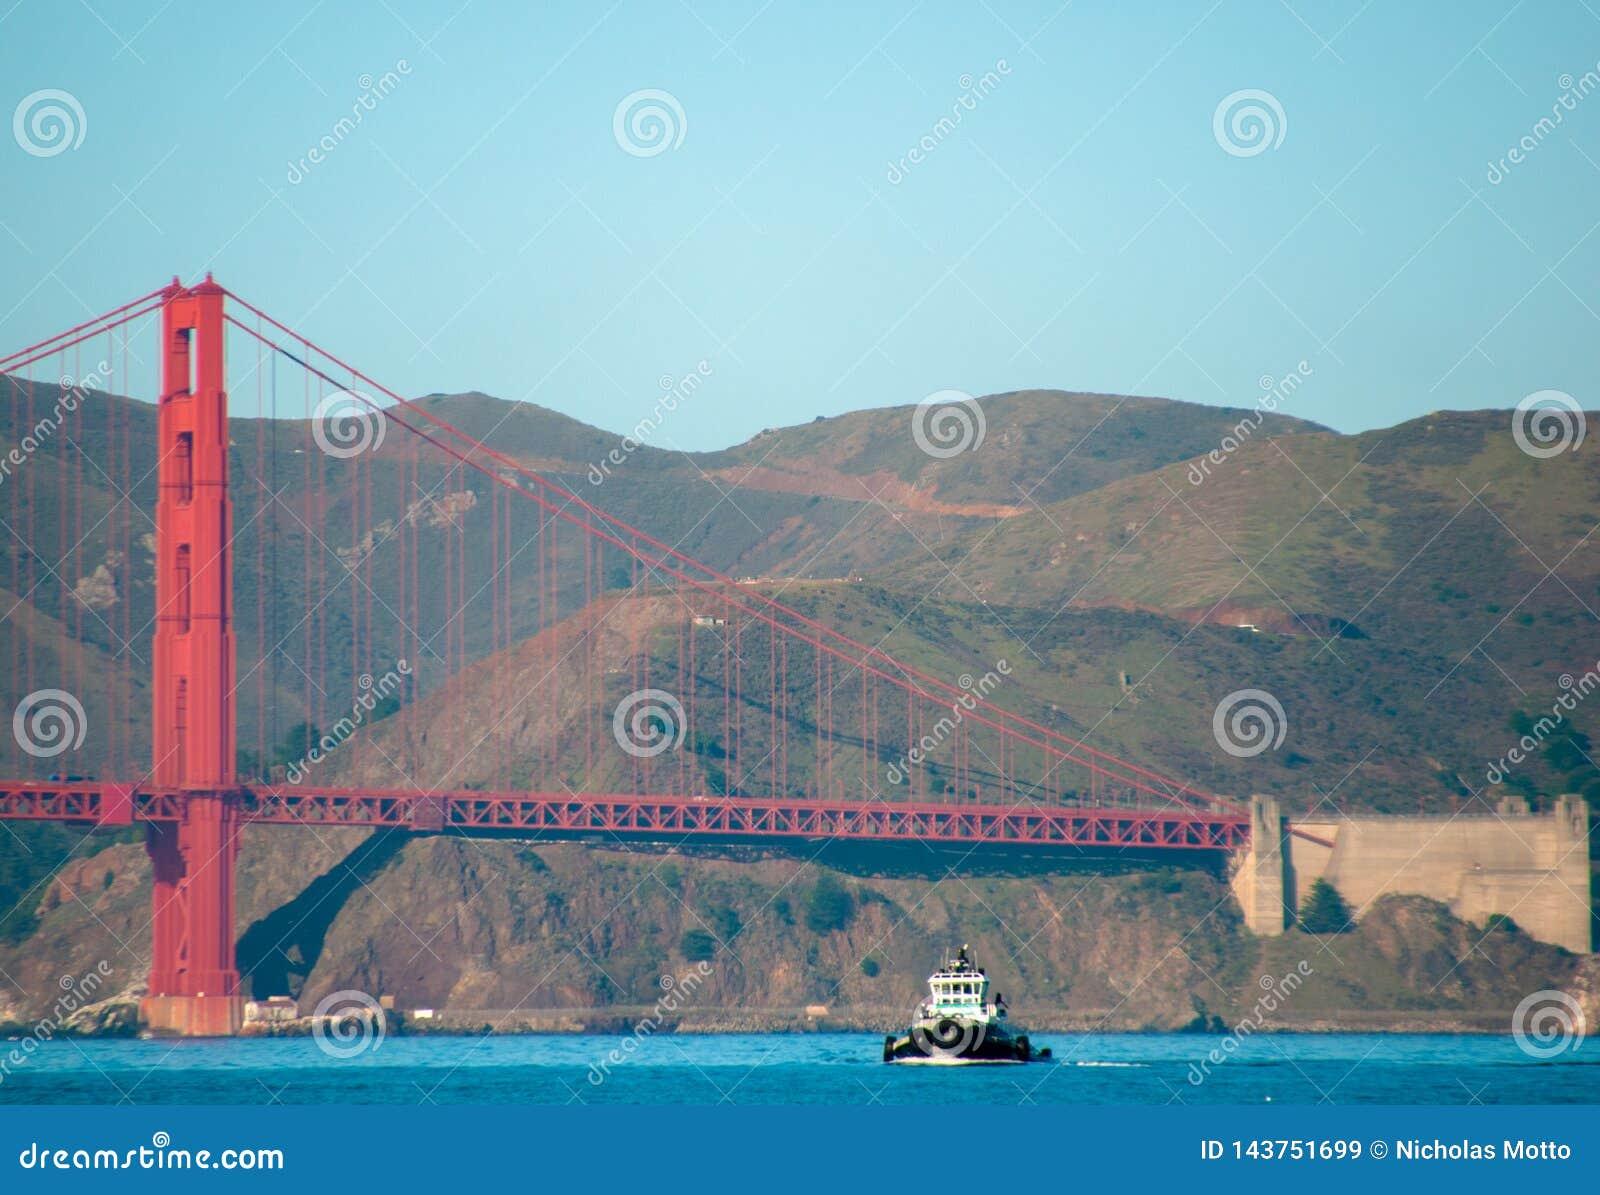 Golden gate bridge-Sleepboot